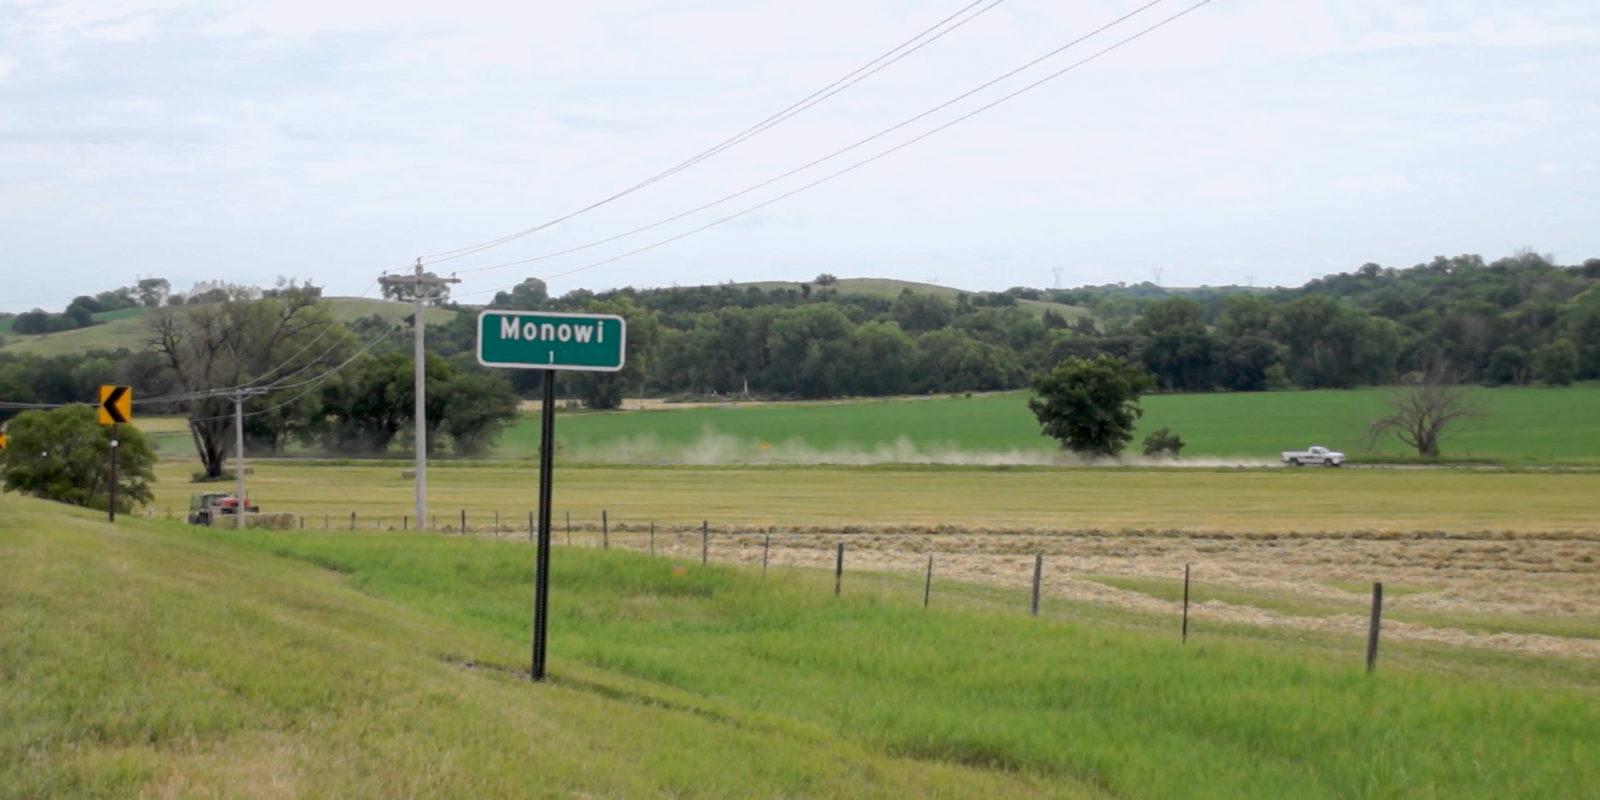 01-Monowi-Nebraska-Ortsschild